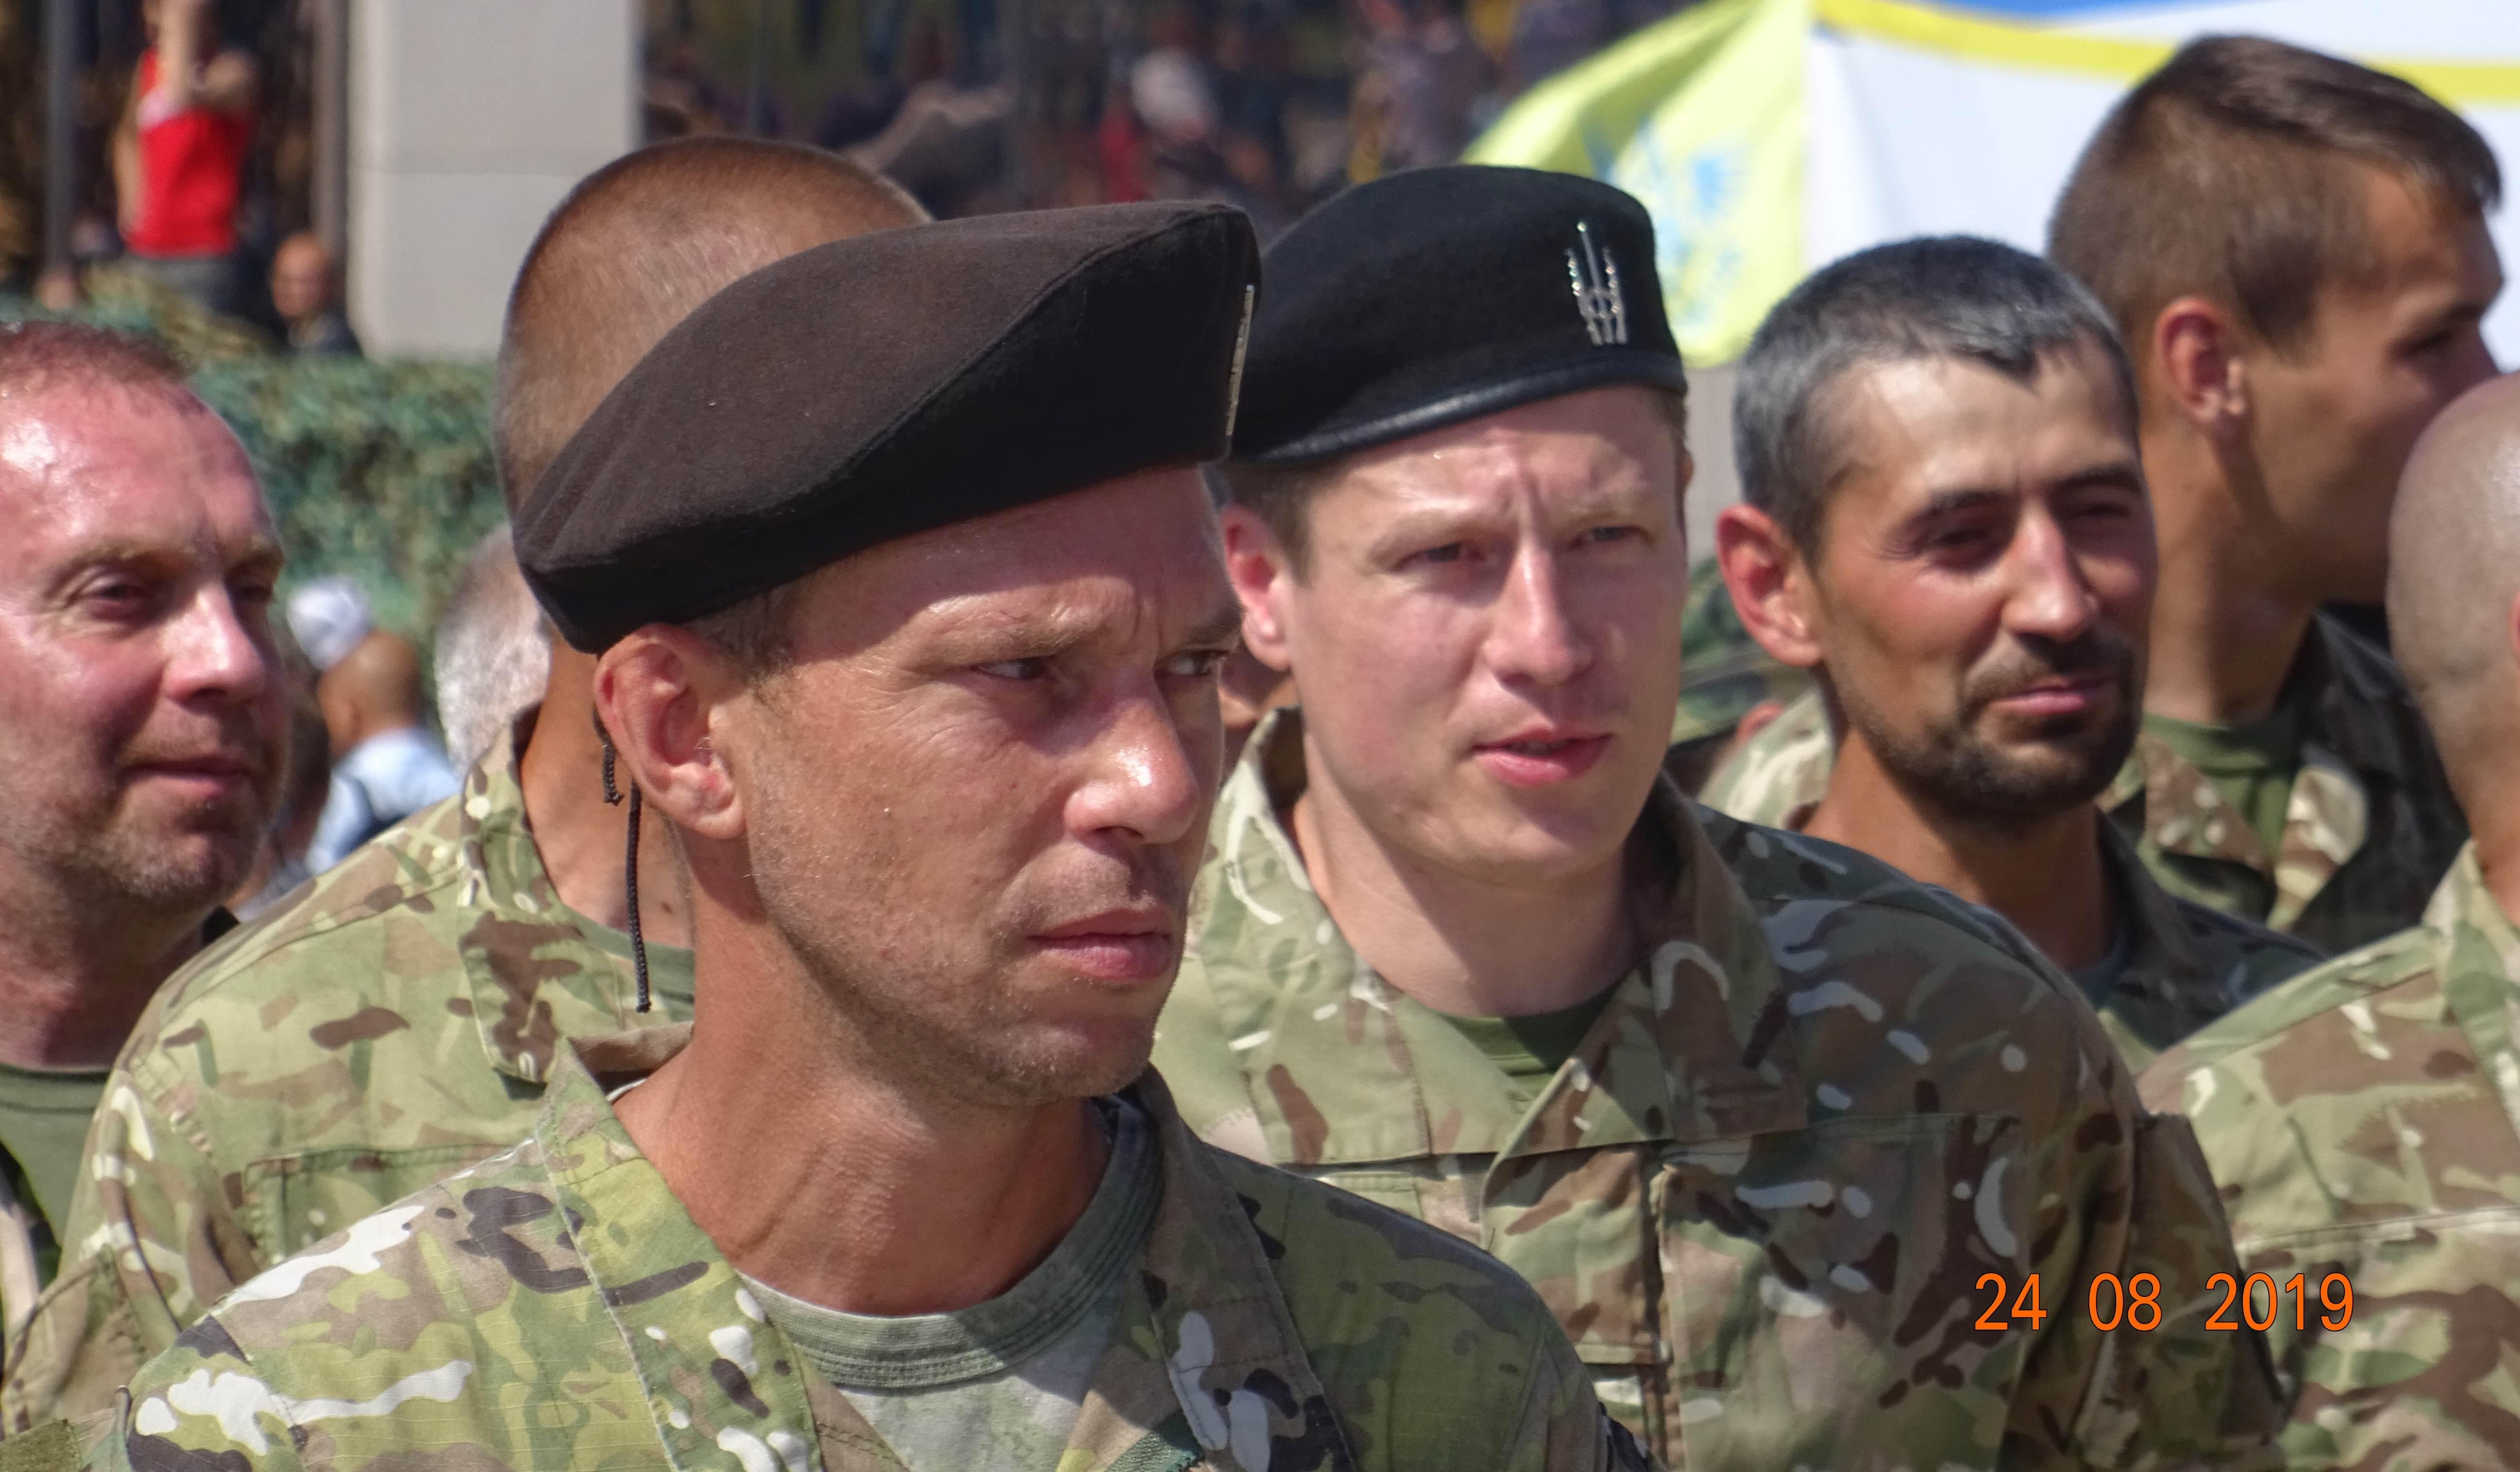 Defenders-of-Ukraine-Parad-24.Aug.19 - DSC06370.jpg